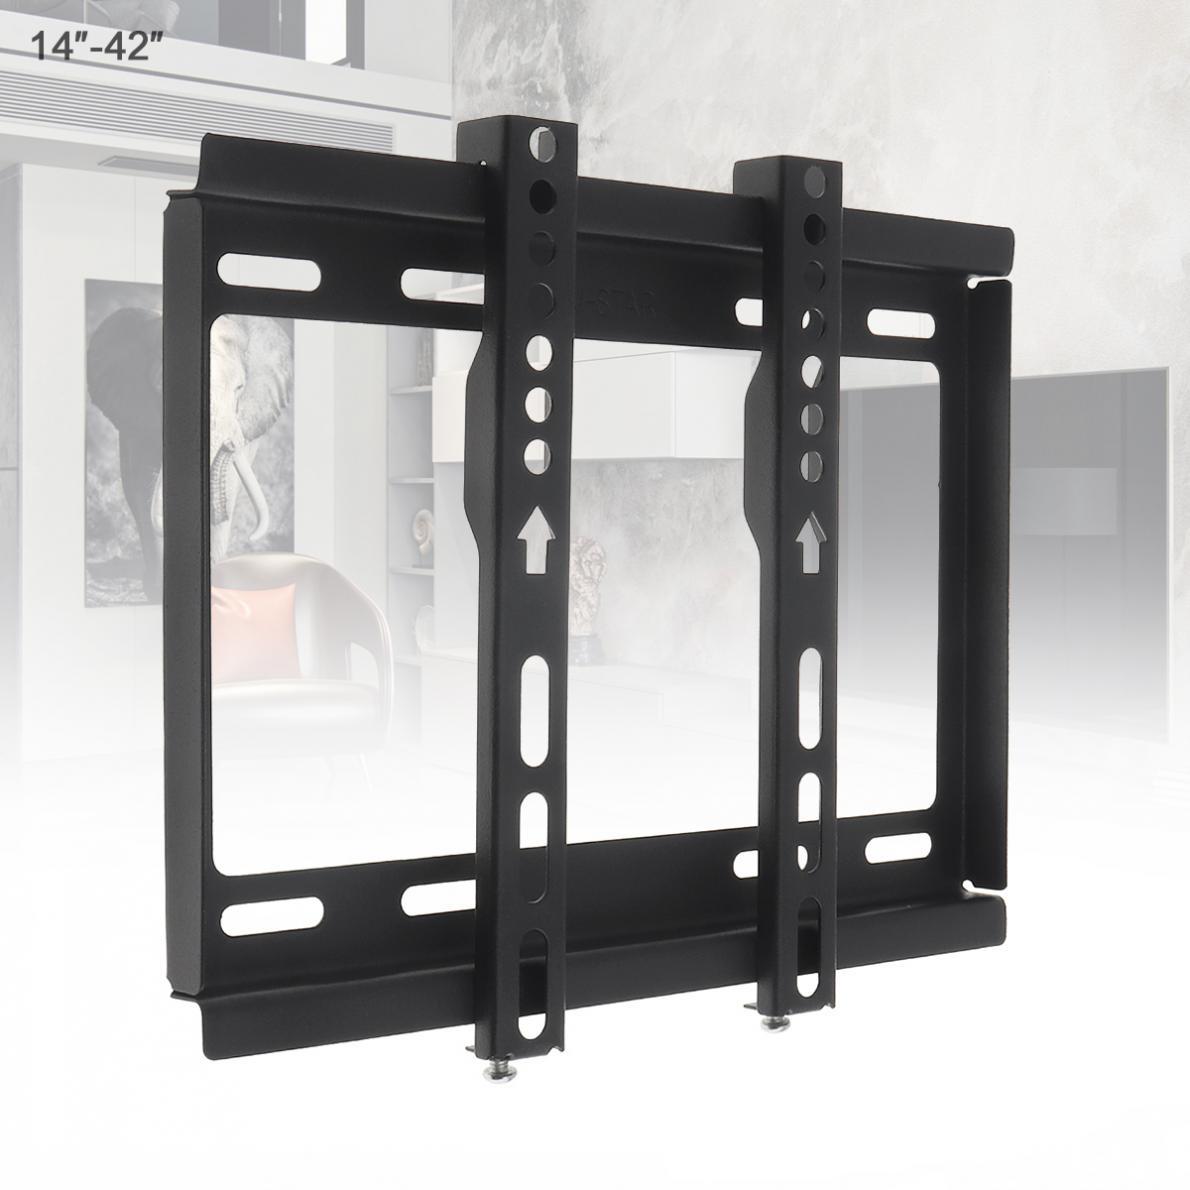 Soporte de montaje en pared para TV Universal, 25KG, 14 - 42 pulgadas, Panel plano, marco de TV para Monitor LCD LED, Pan plano